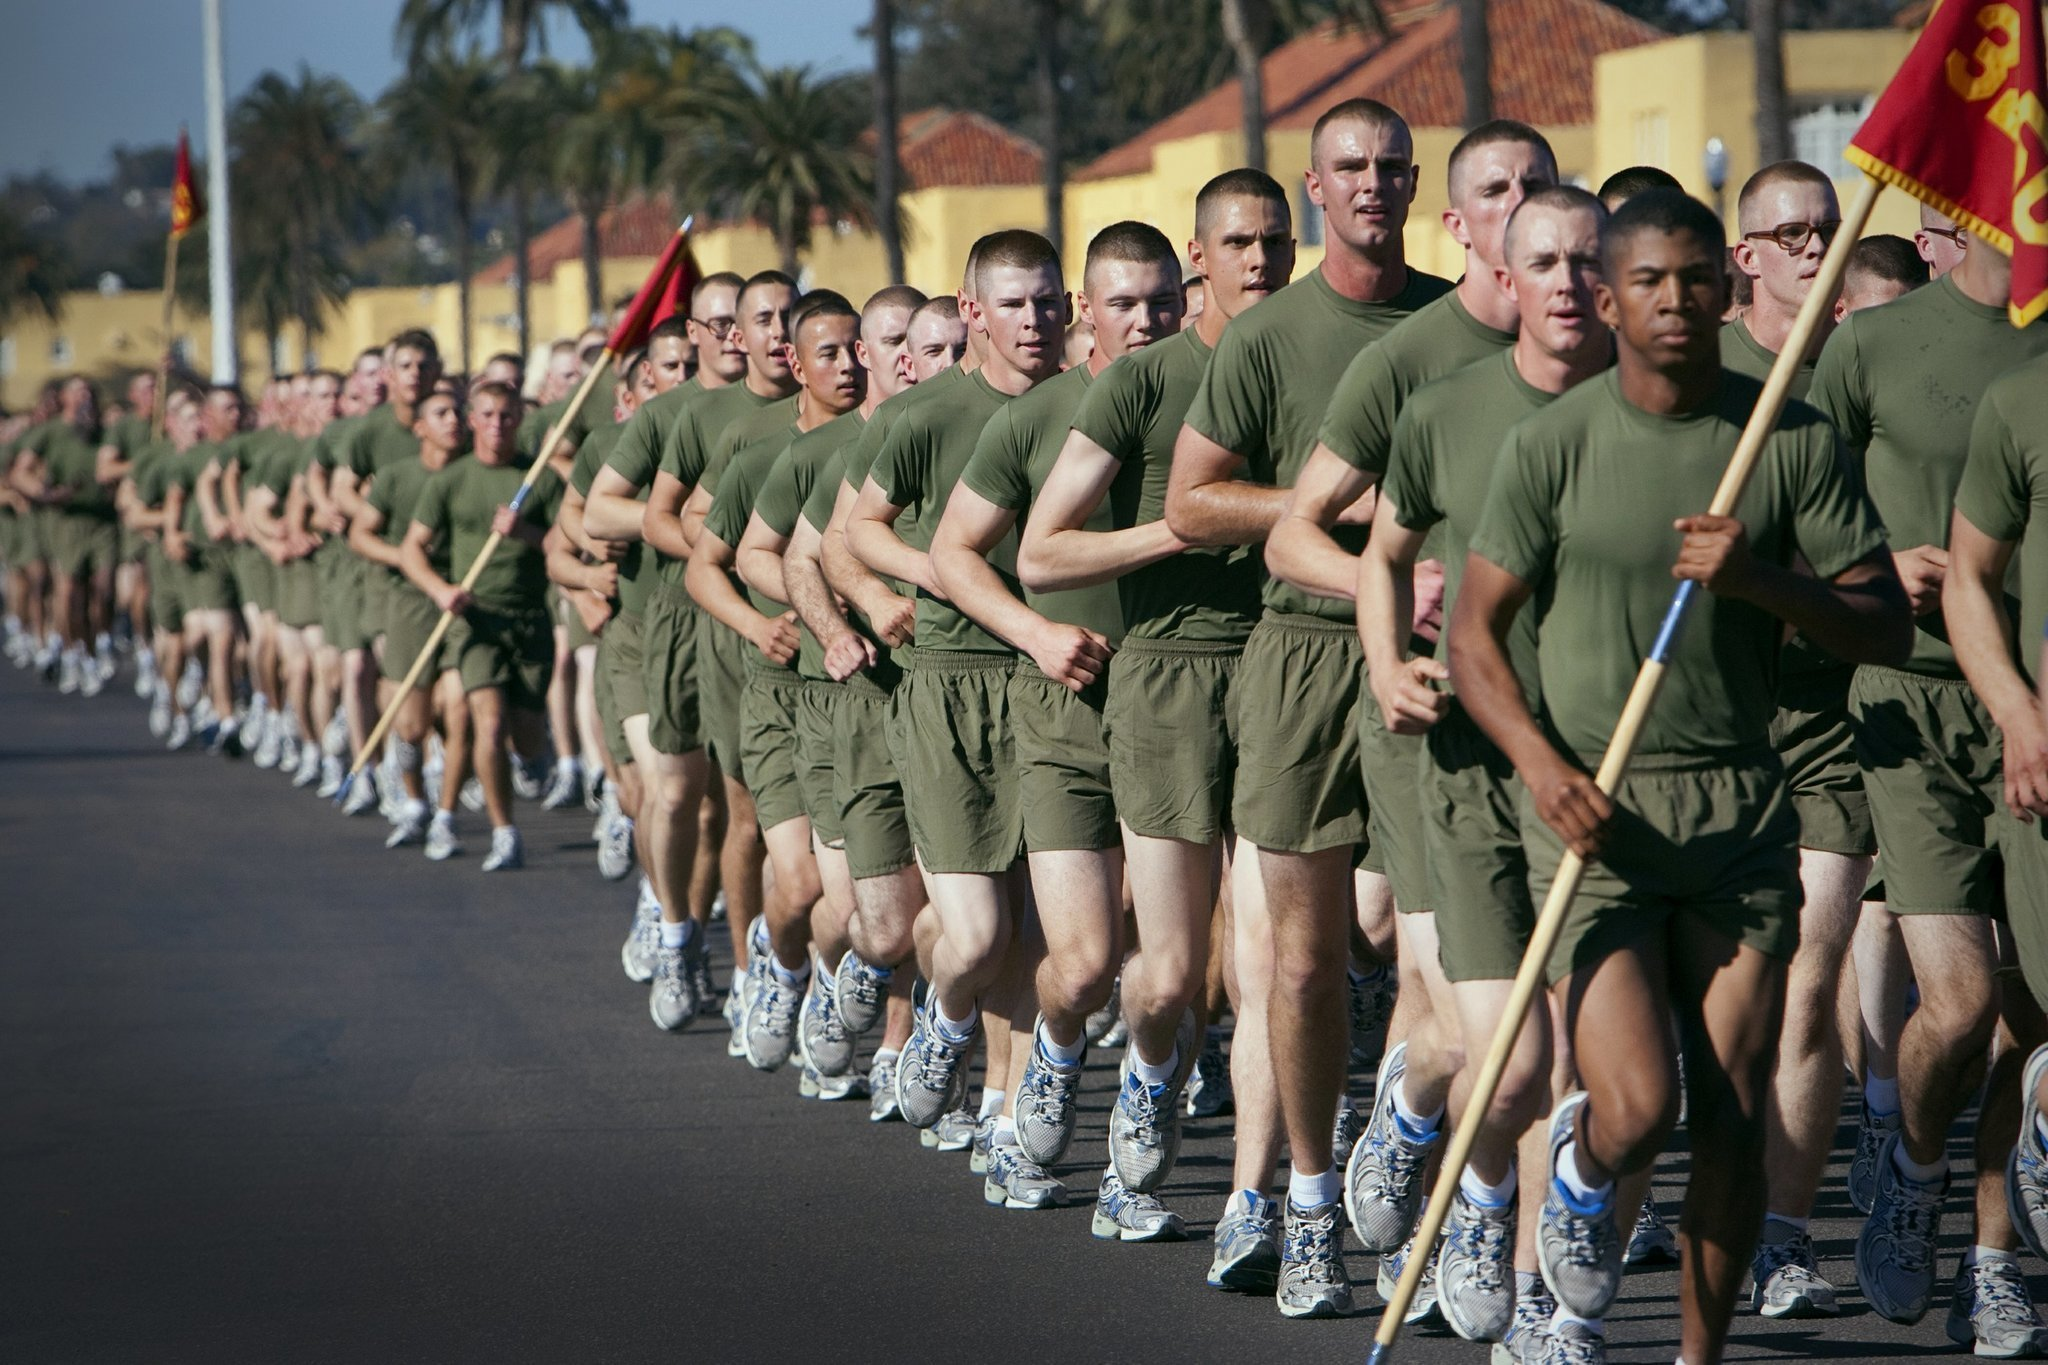 Marine Recruit Treated For Meningitis The San Diego